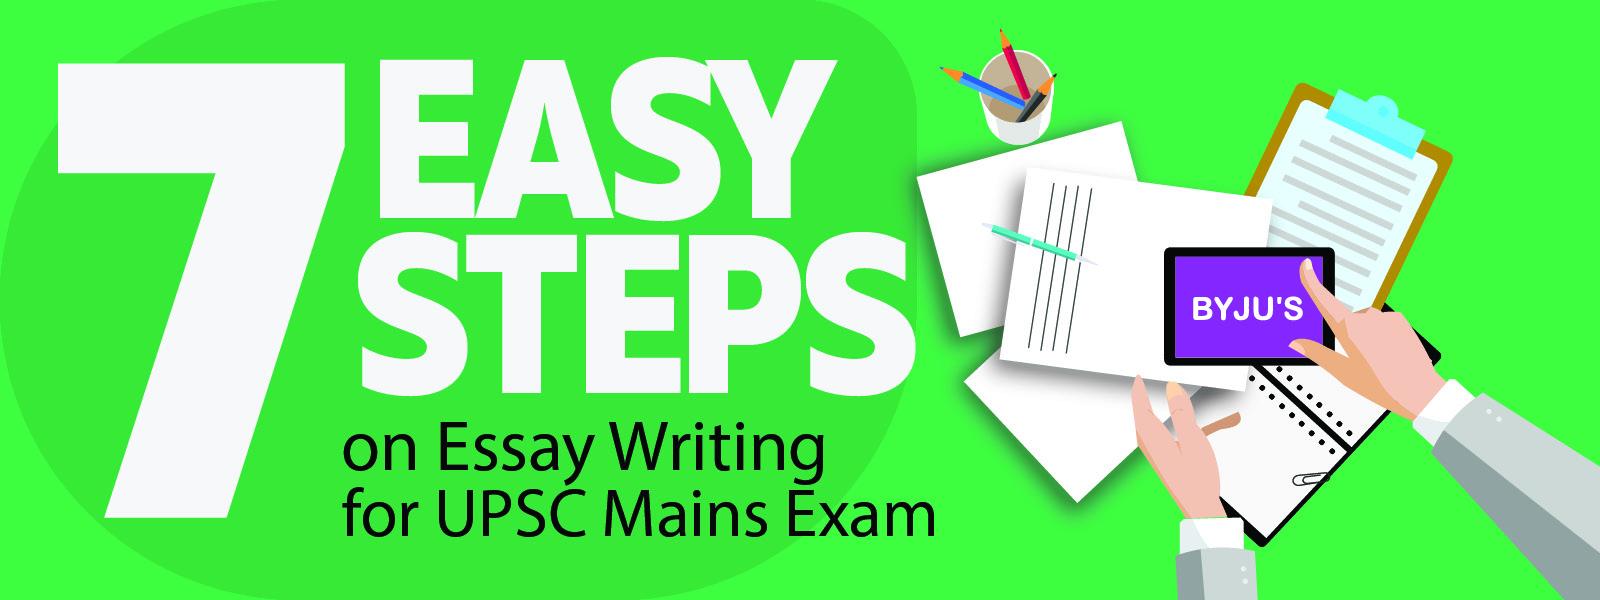 7 easy steps for UPSC Essay Writing